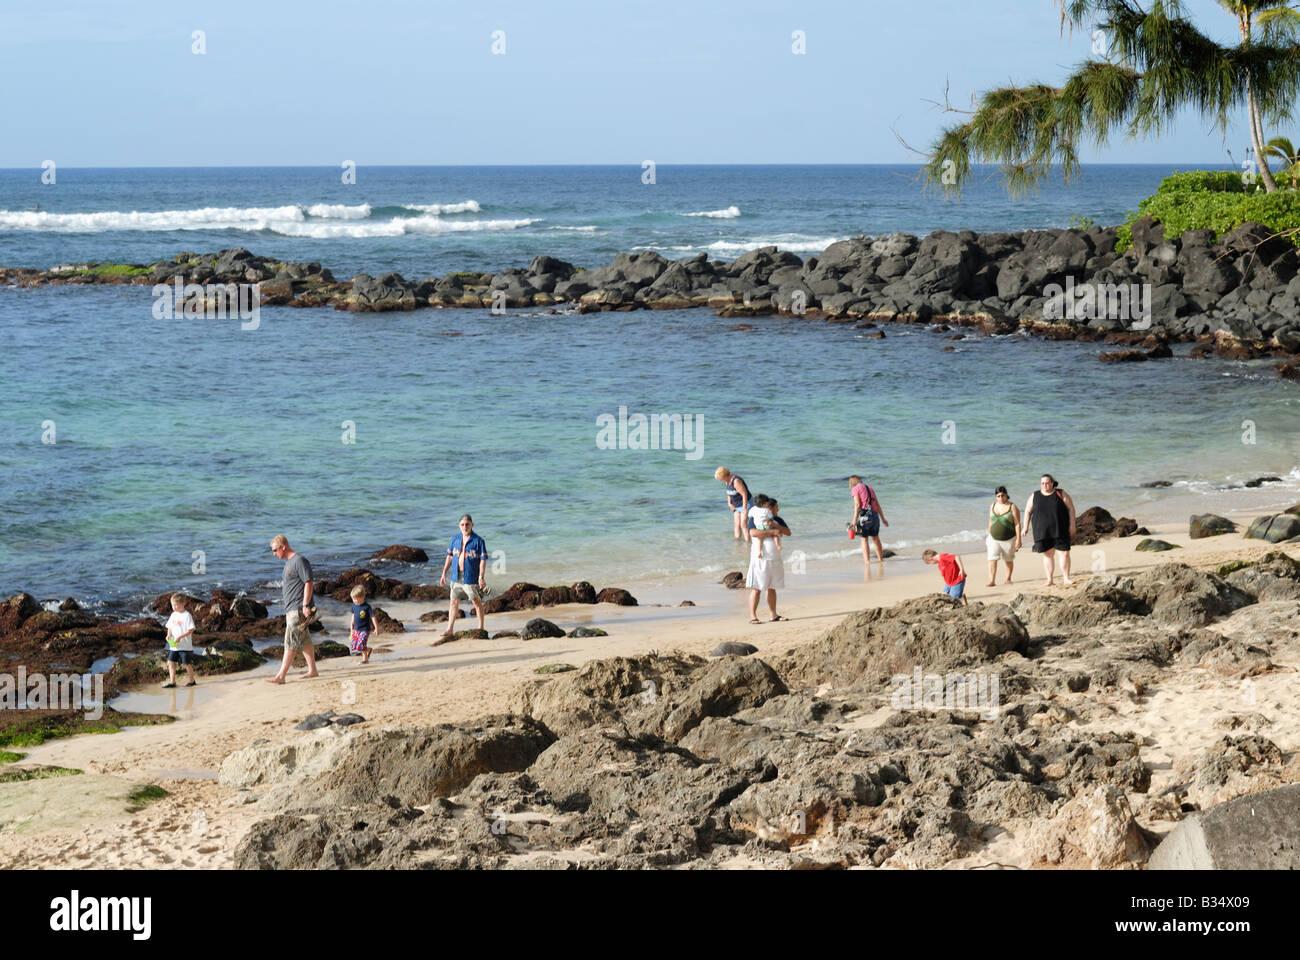 Turtle Beach Northshore Oahu Hawaii - Stock Image